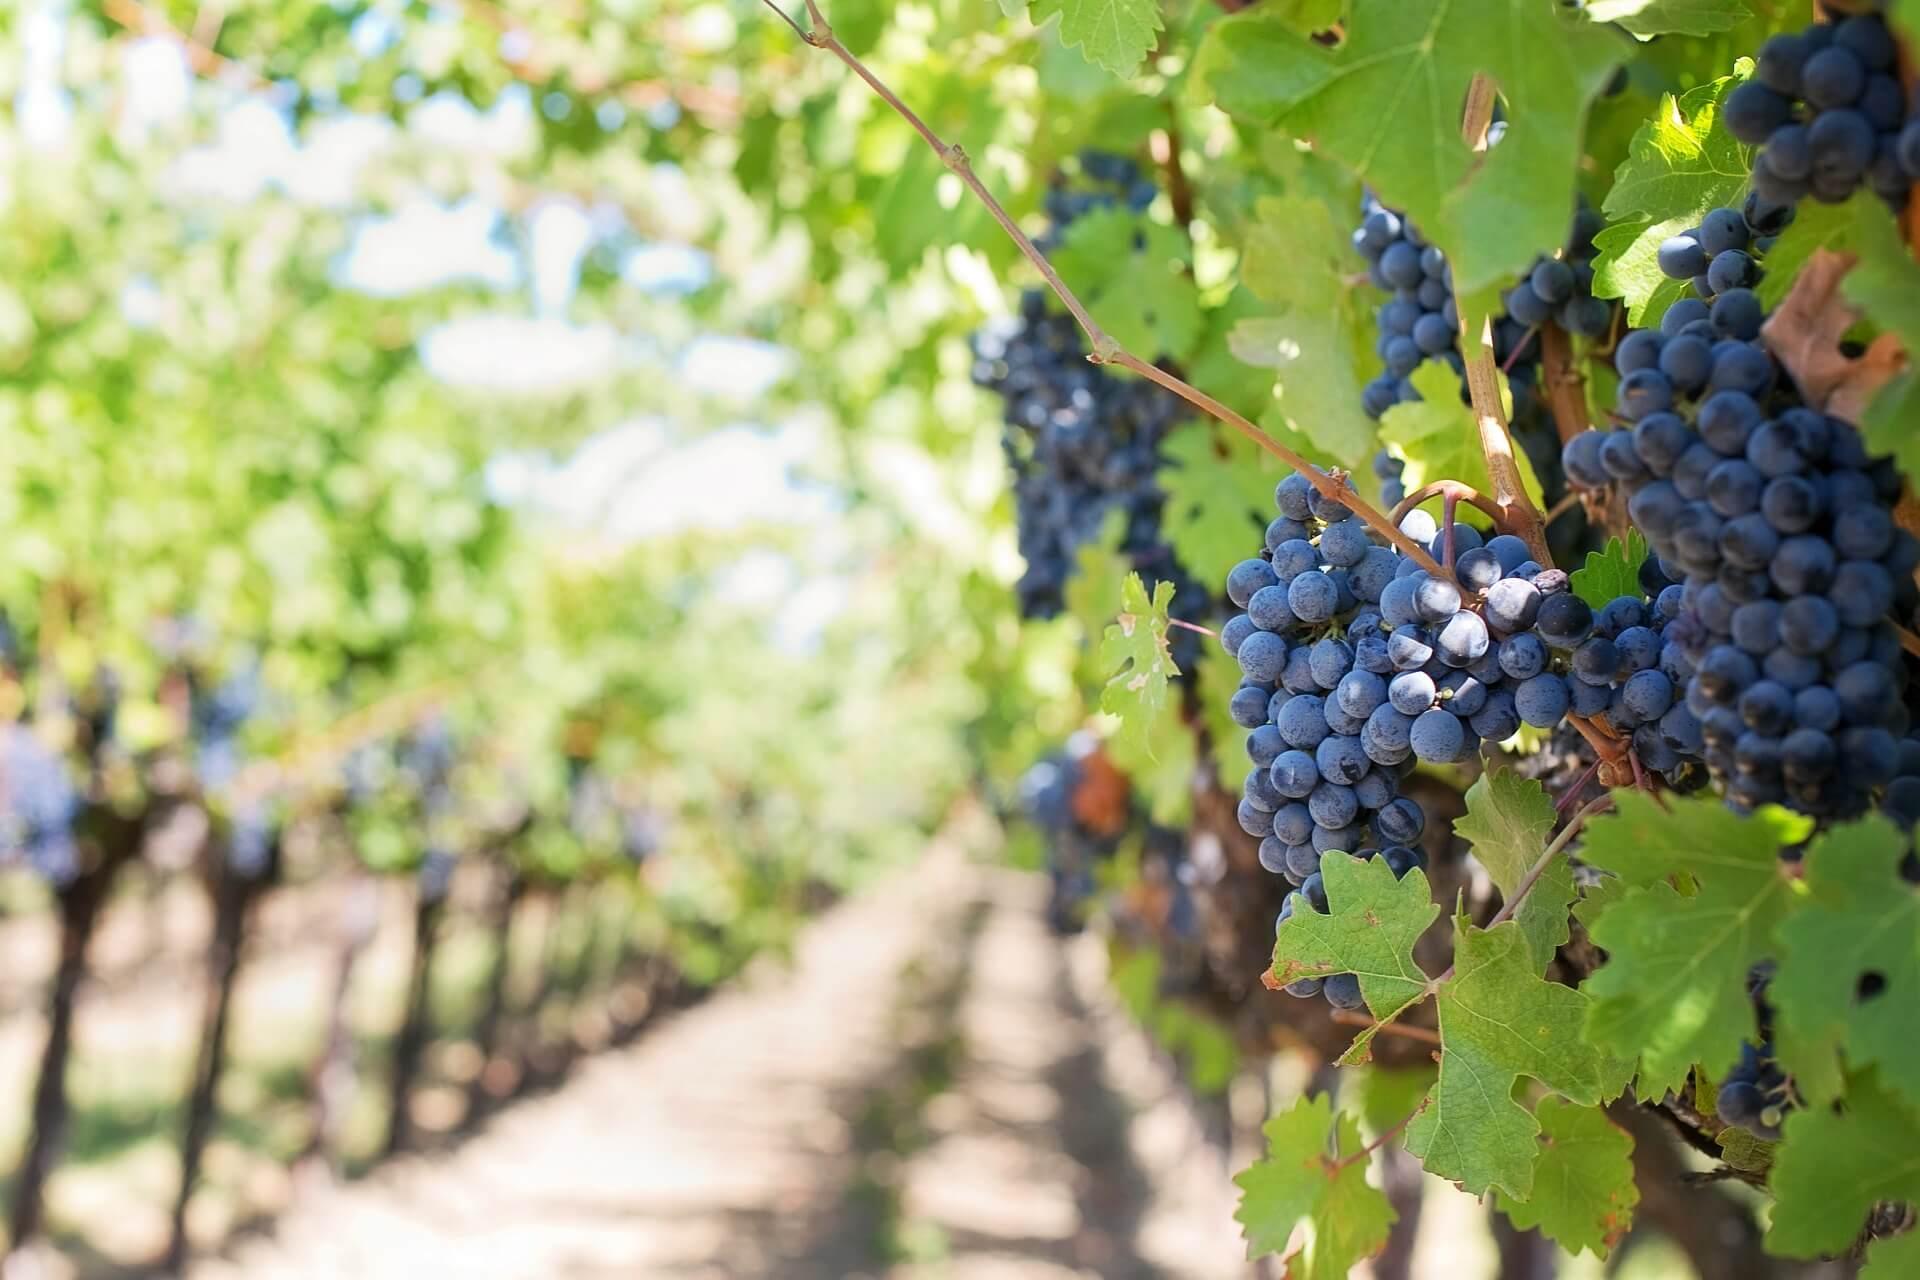 ICYMI: ShipCompliant by Sovos Wine Summit 2019